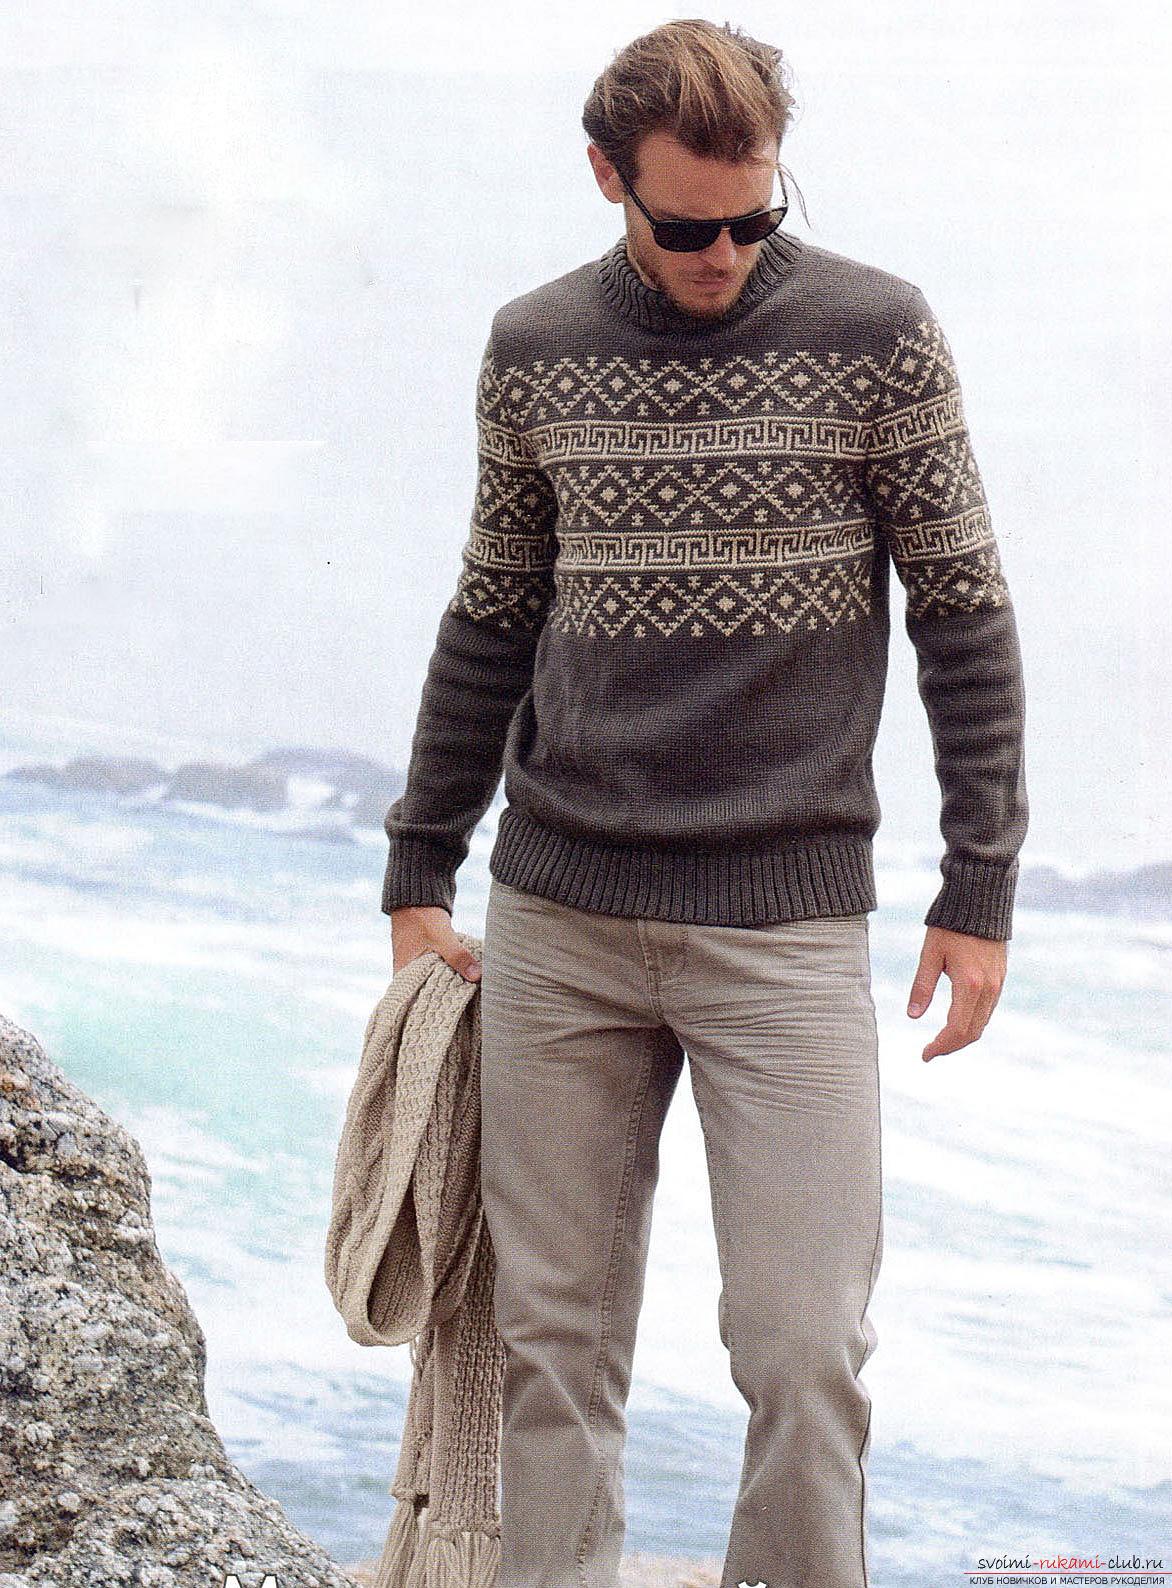 Вязание спицами для мужчин свитера с норвежским узором